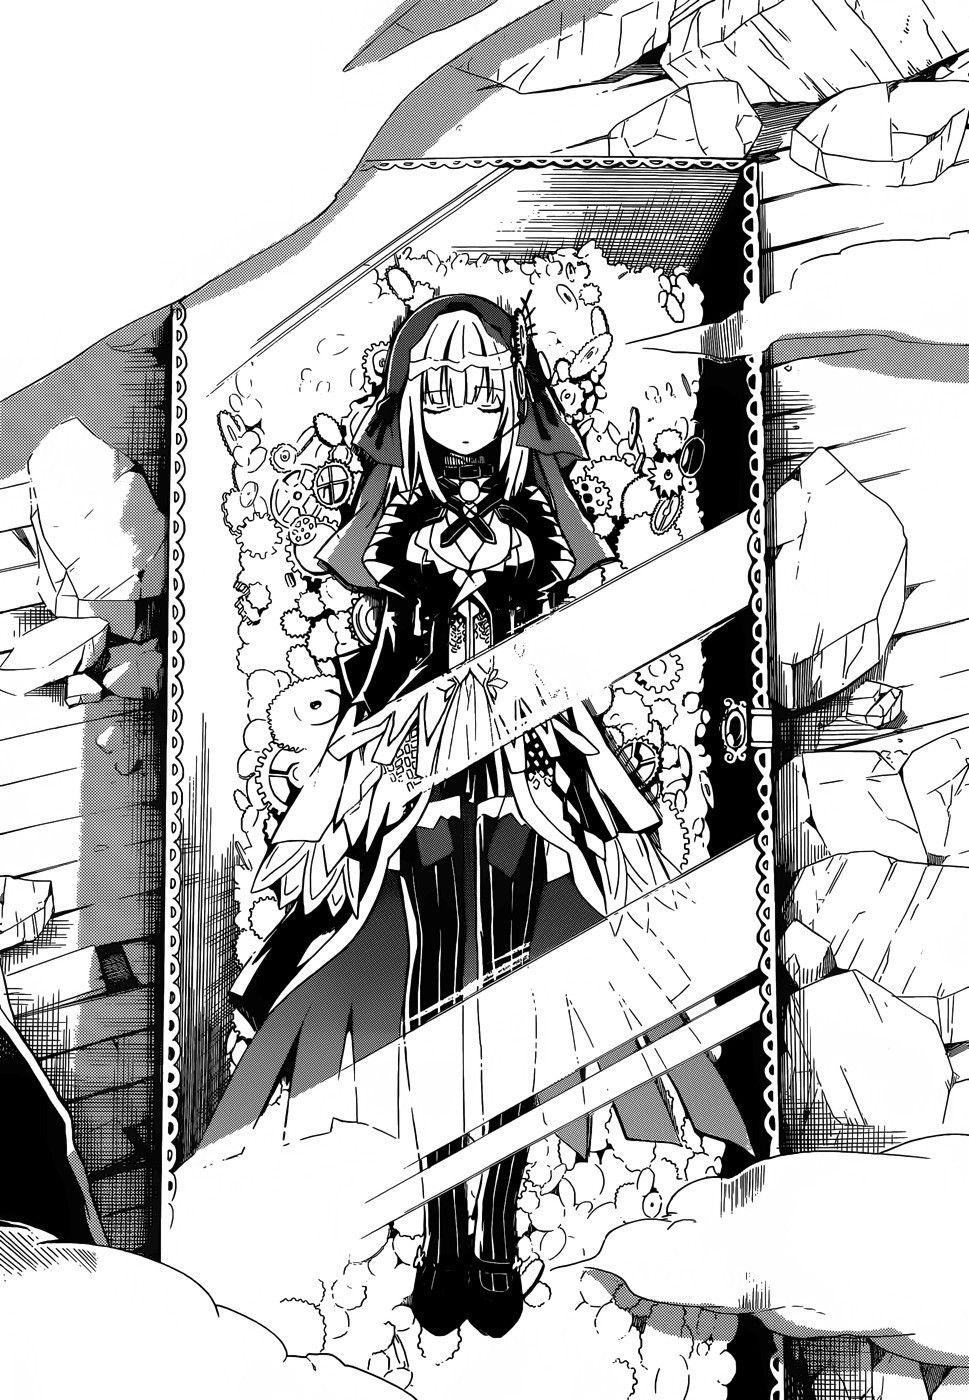 Kaworu Nagisa Neon genesis evangelion